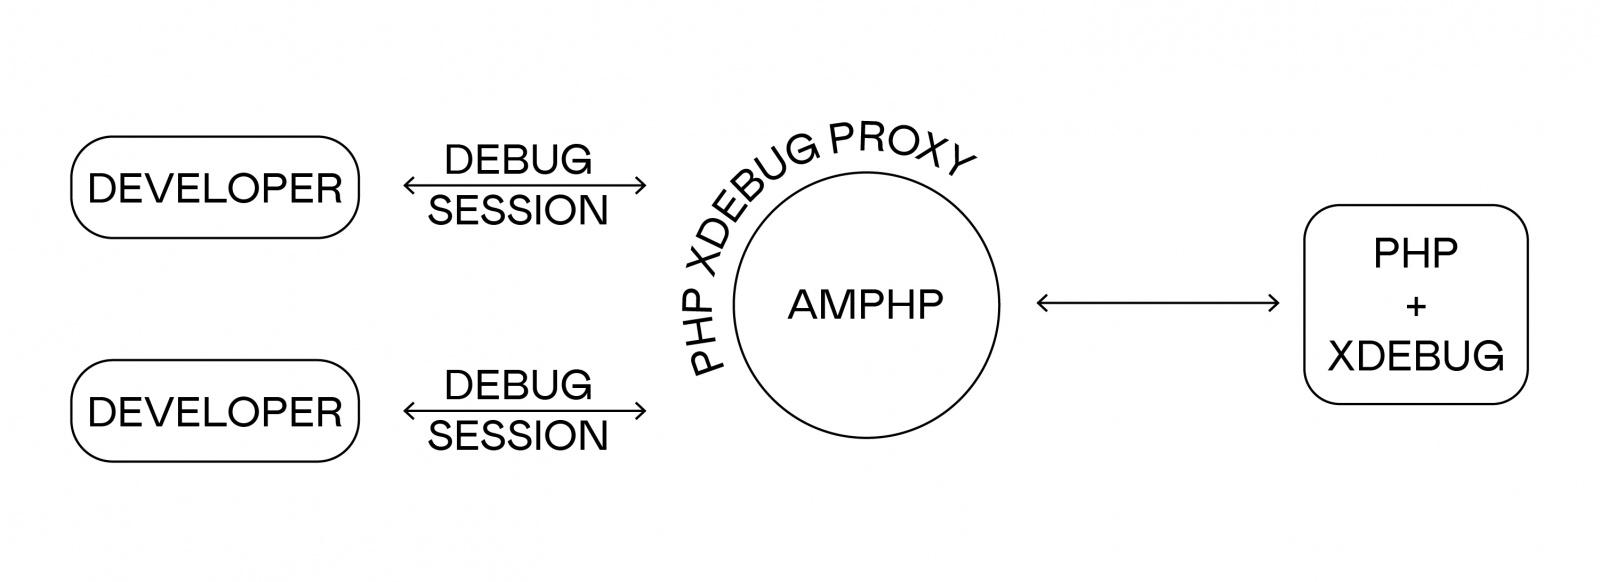 PHP Xdebug proxy